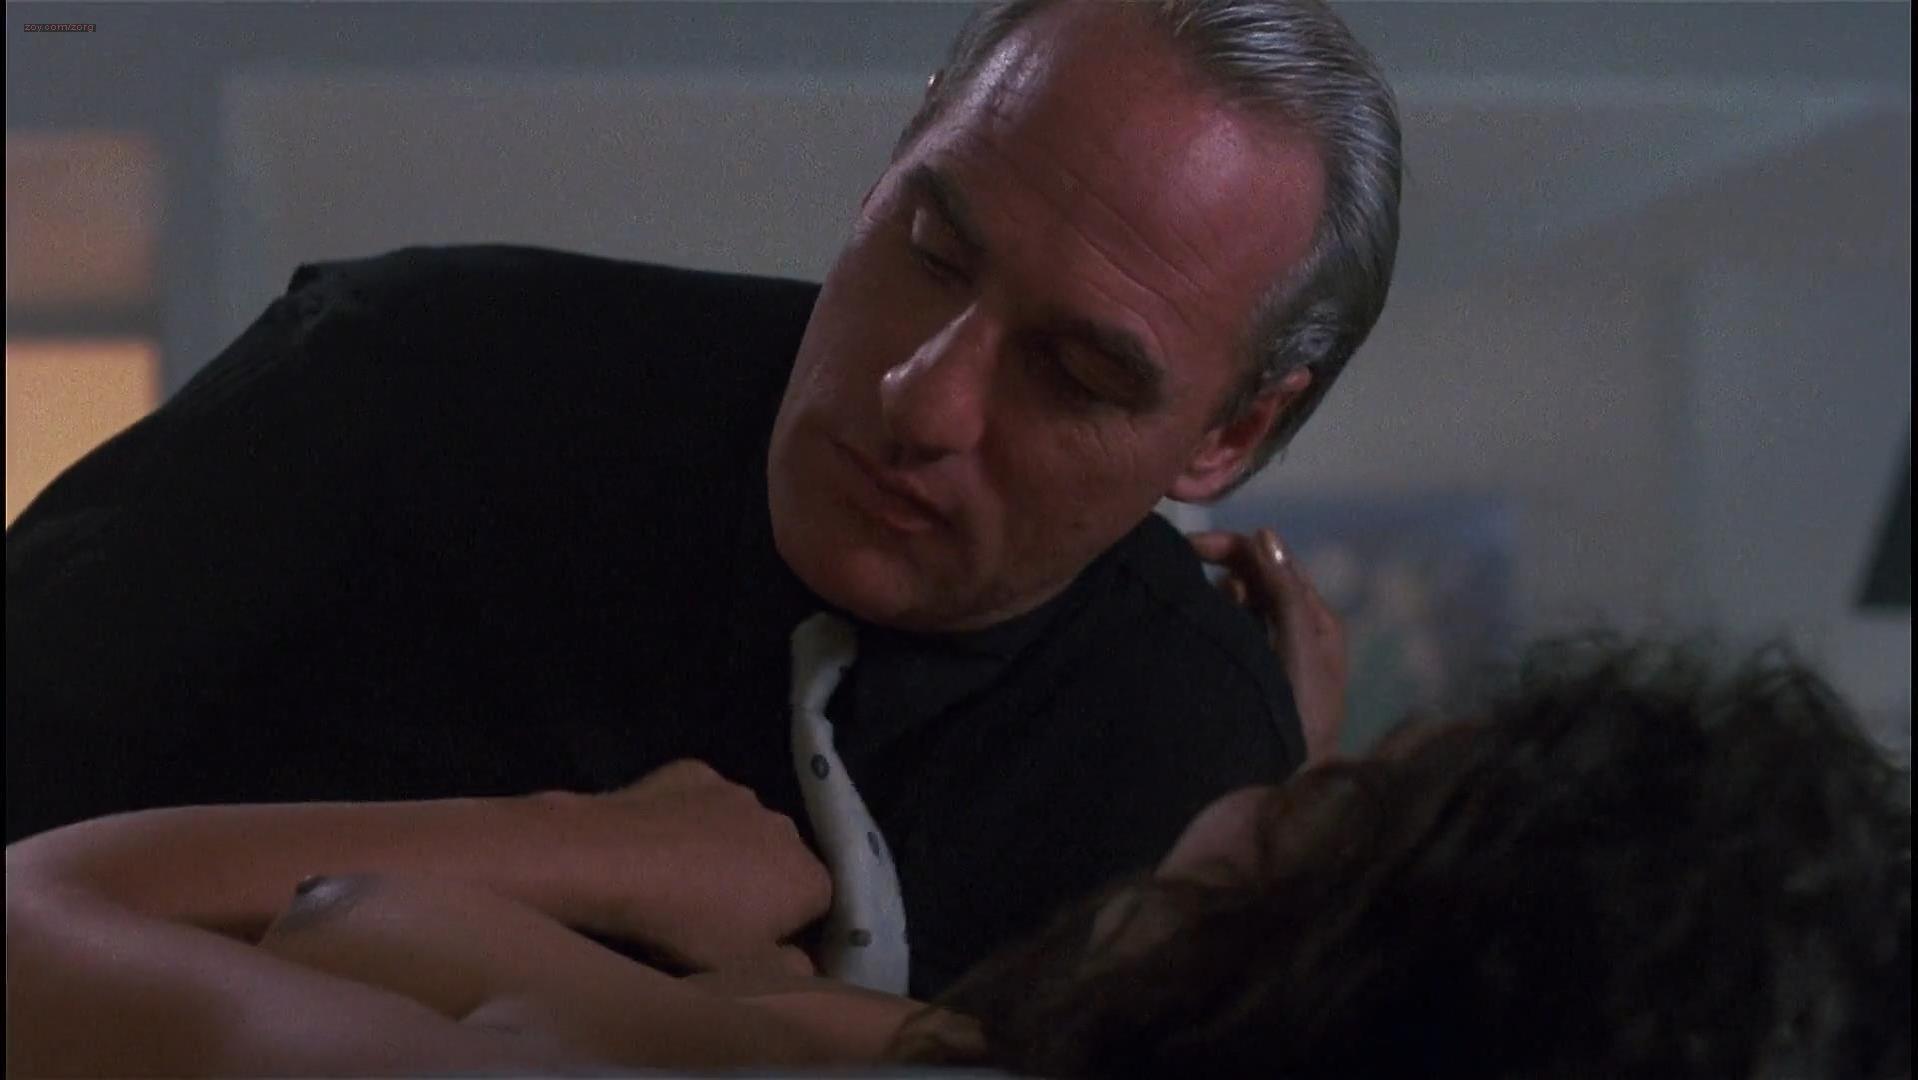 Vanity nude - Action Jackson (1988)